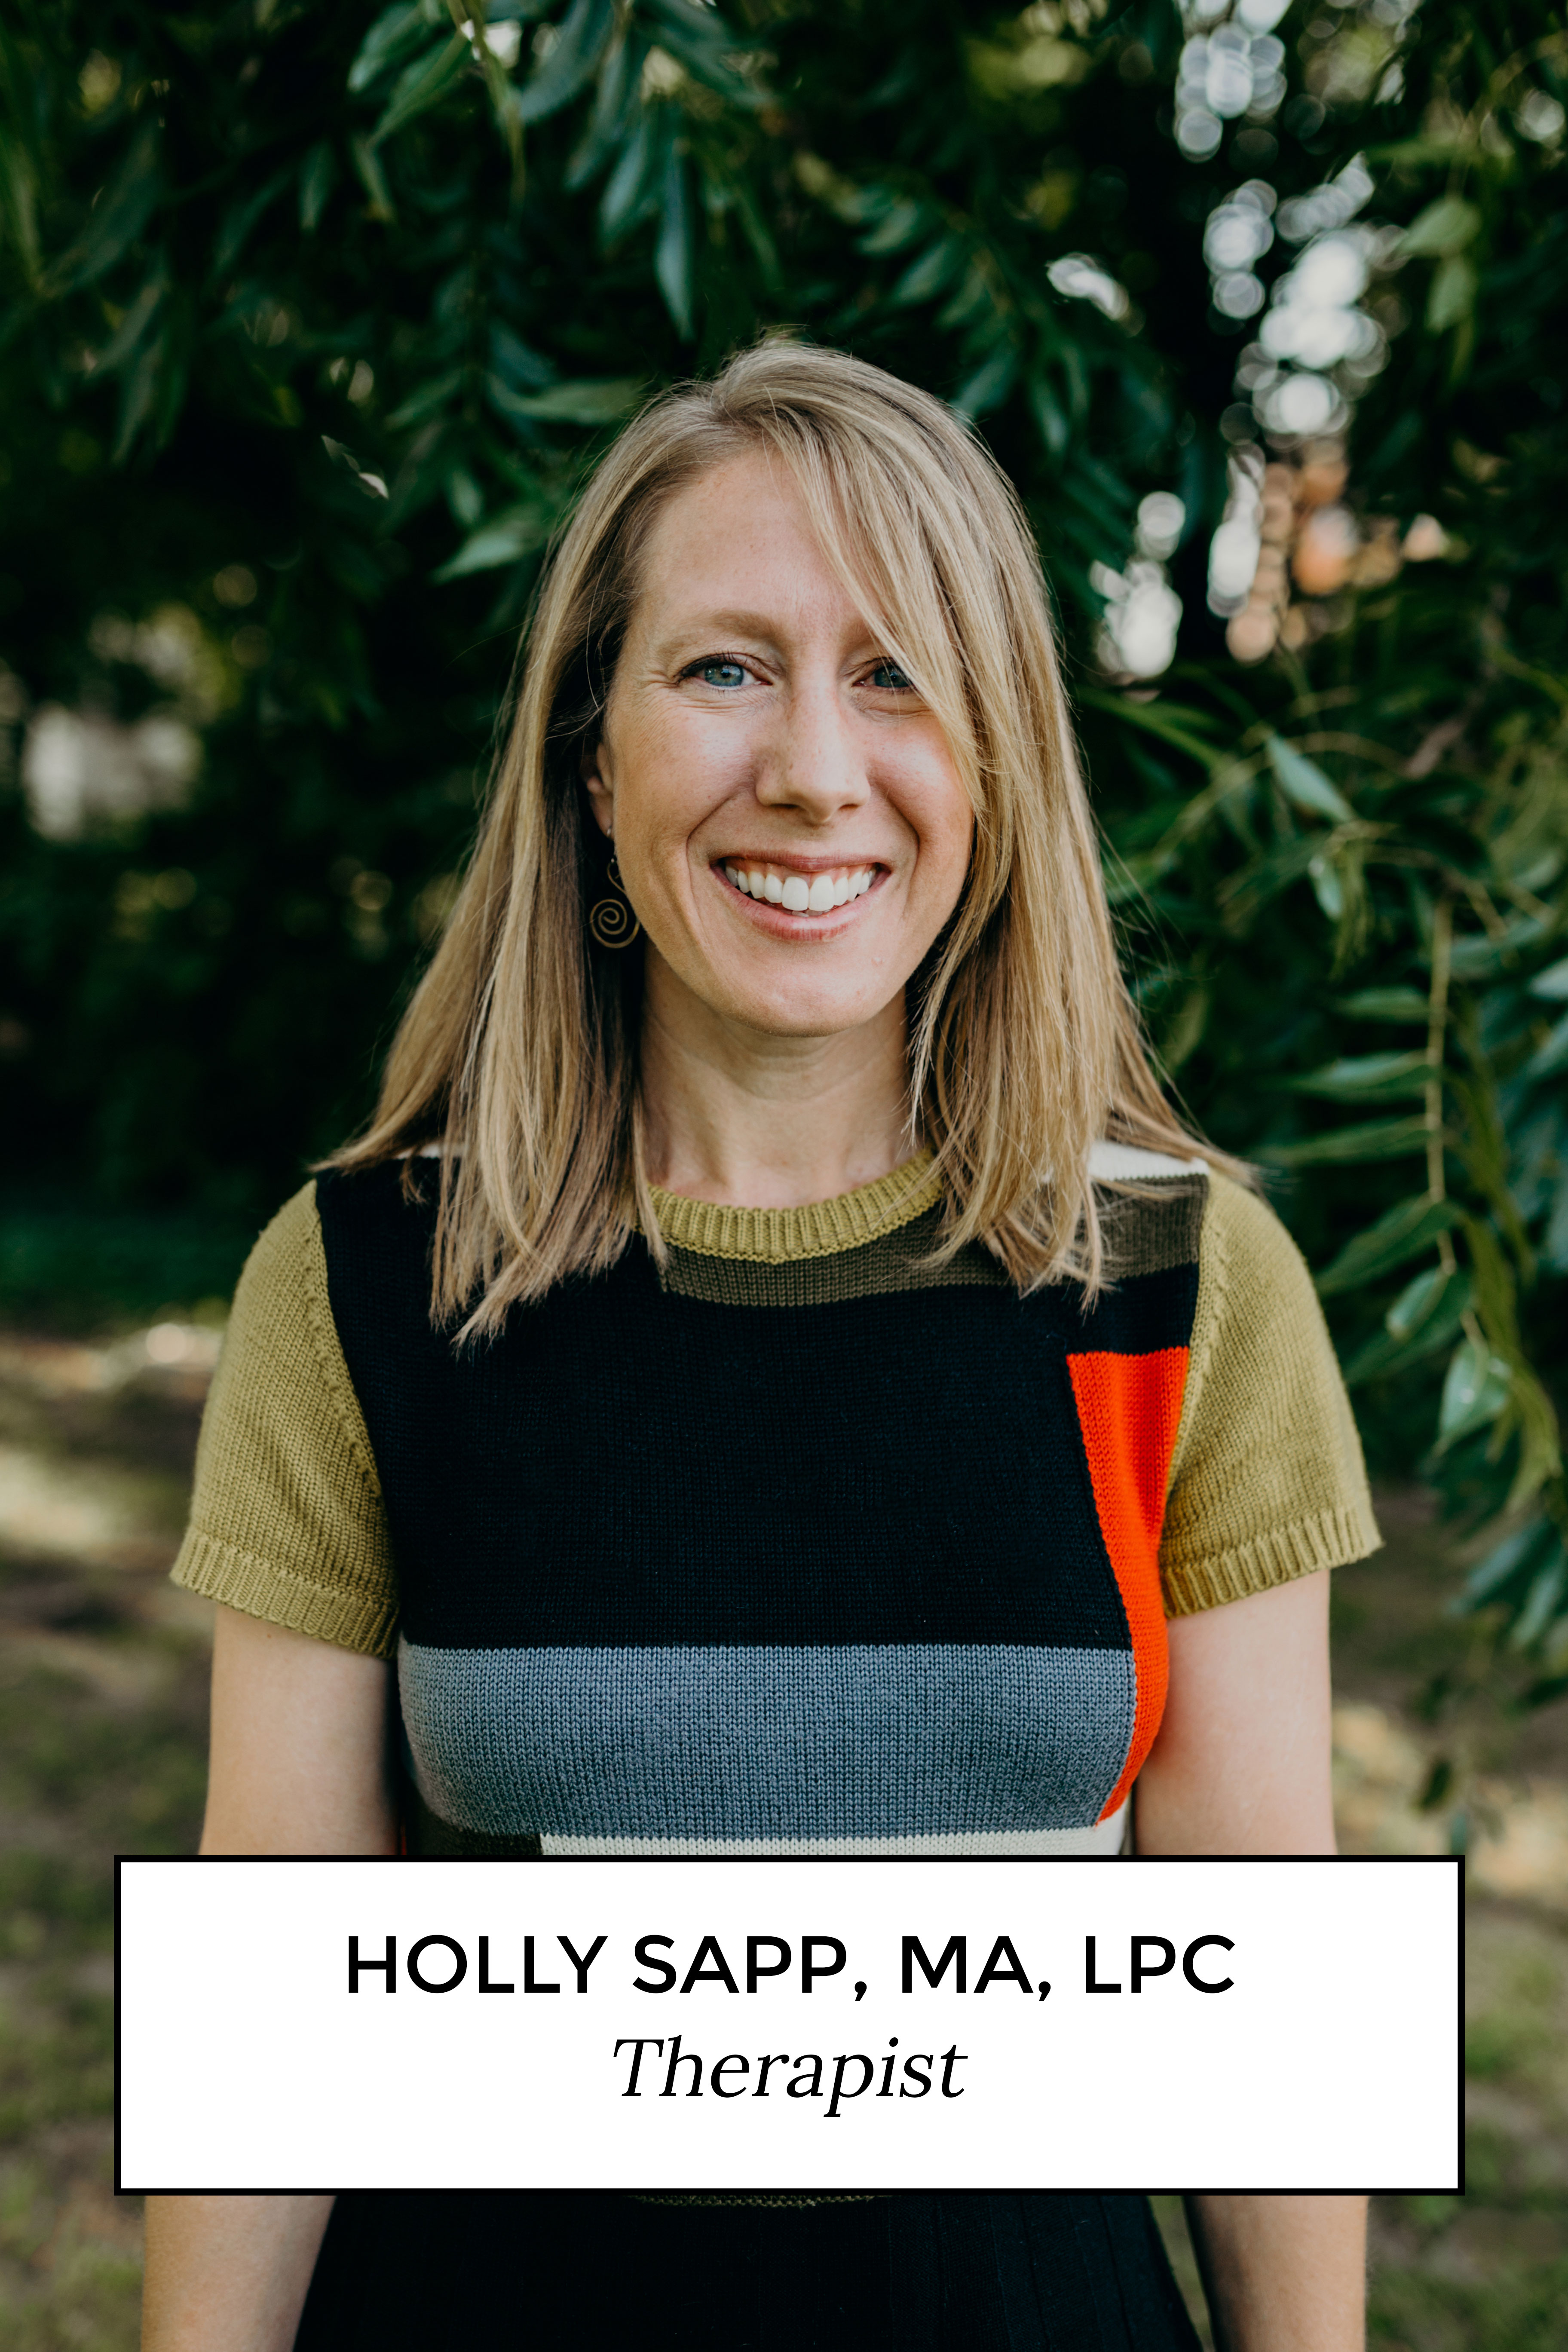 Holly Sapp, MA, LPC Therapist